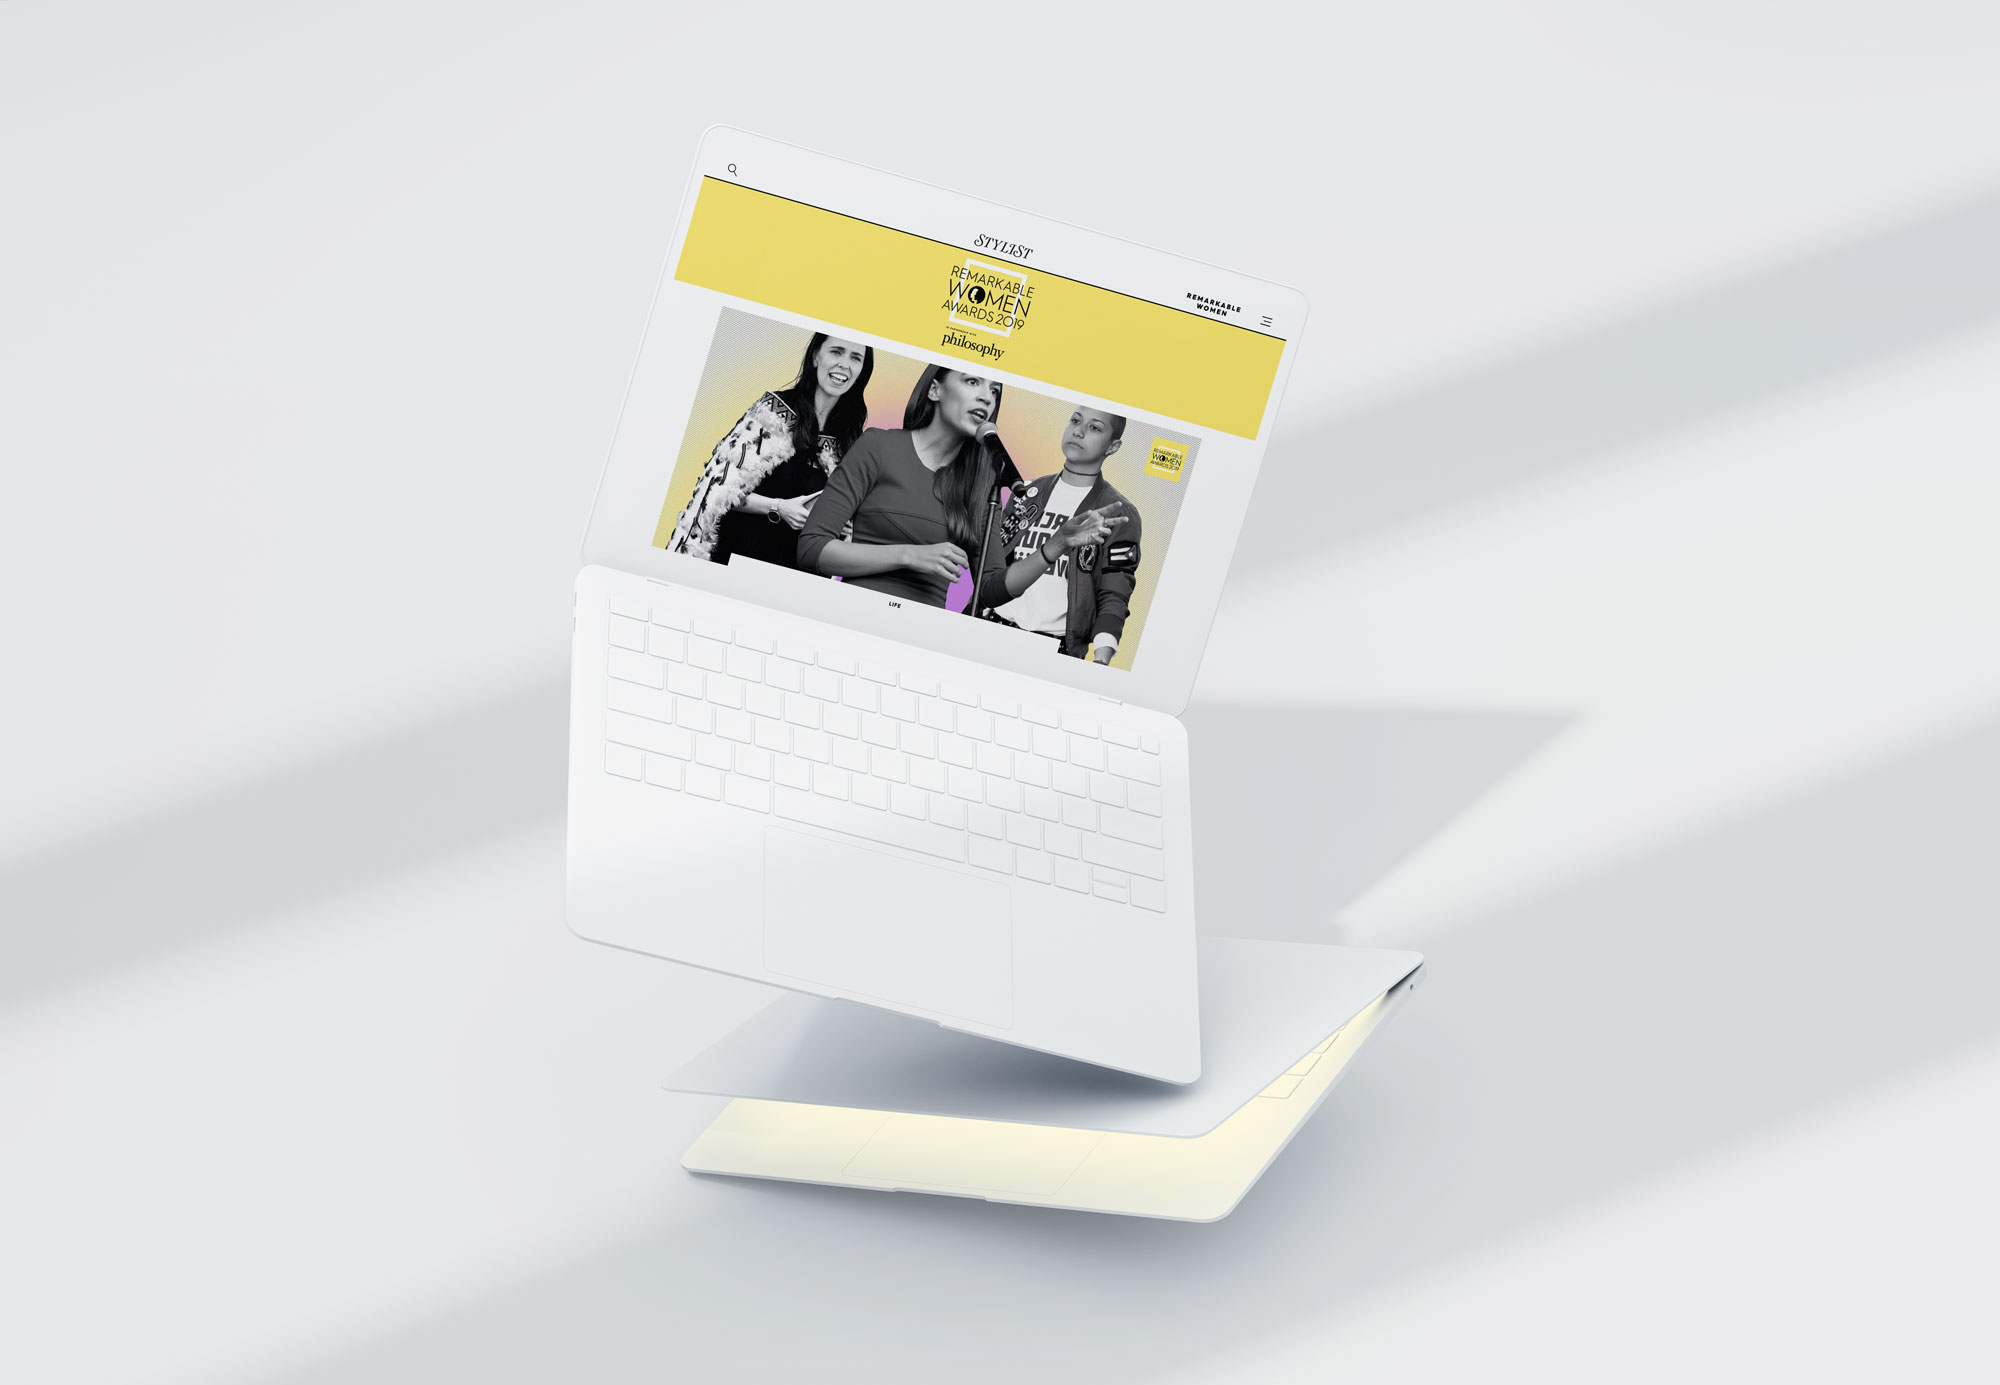 contentseries-laptopmockup